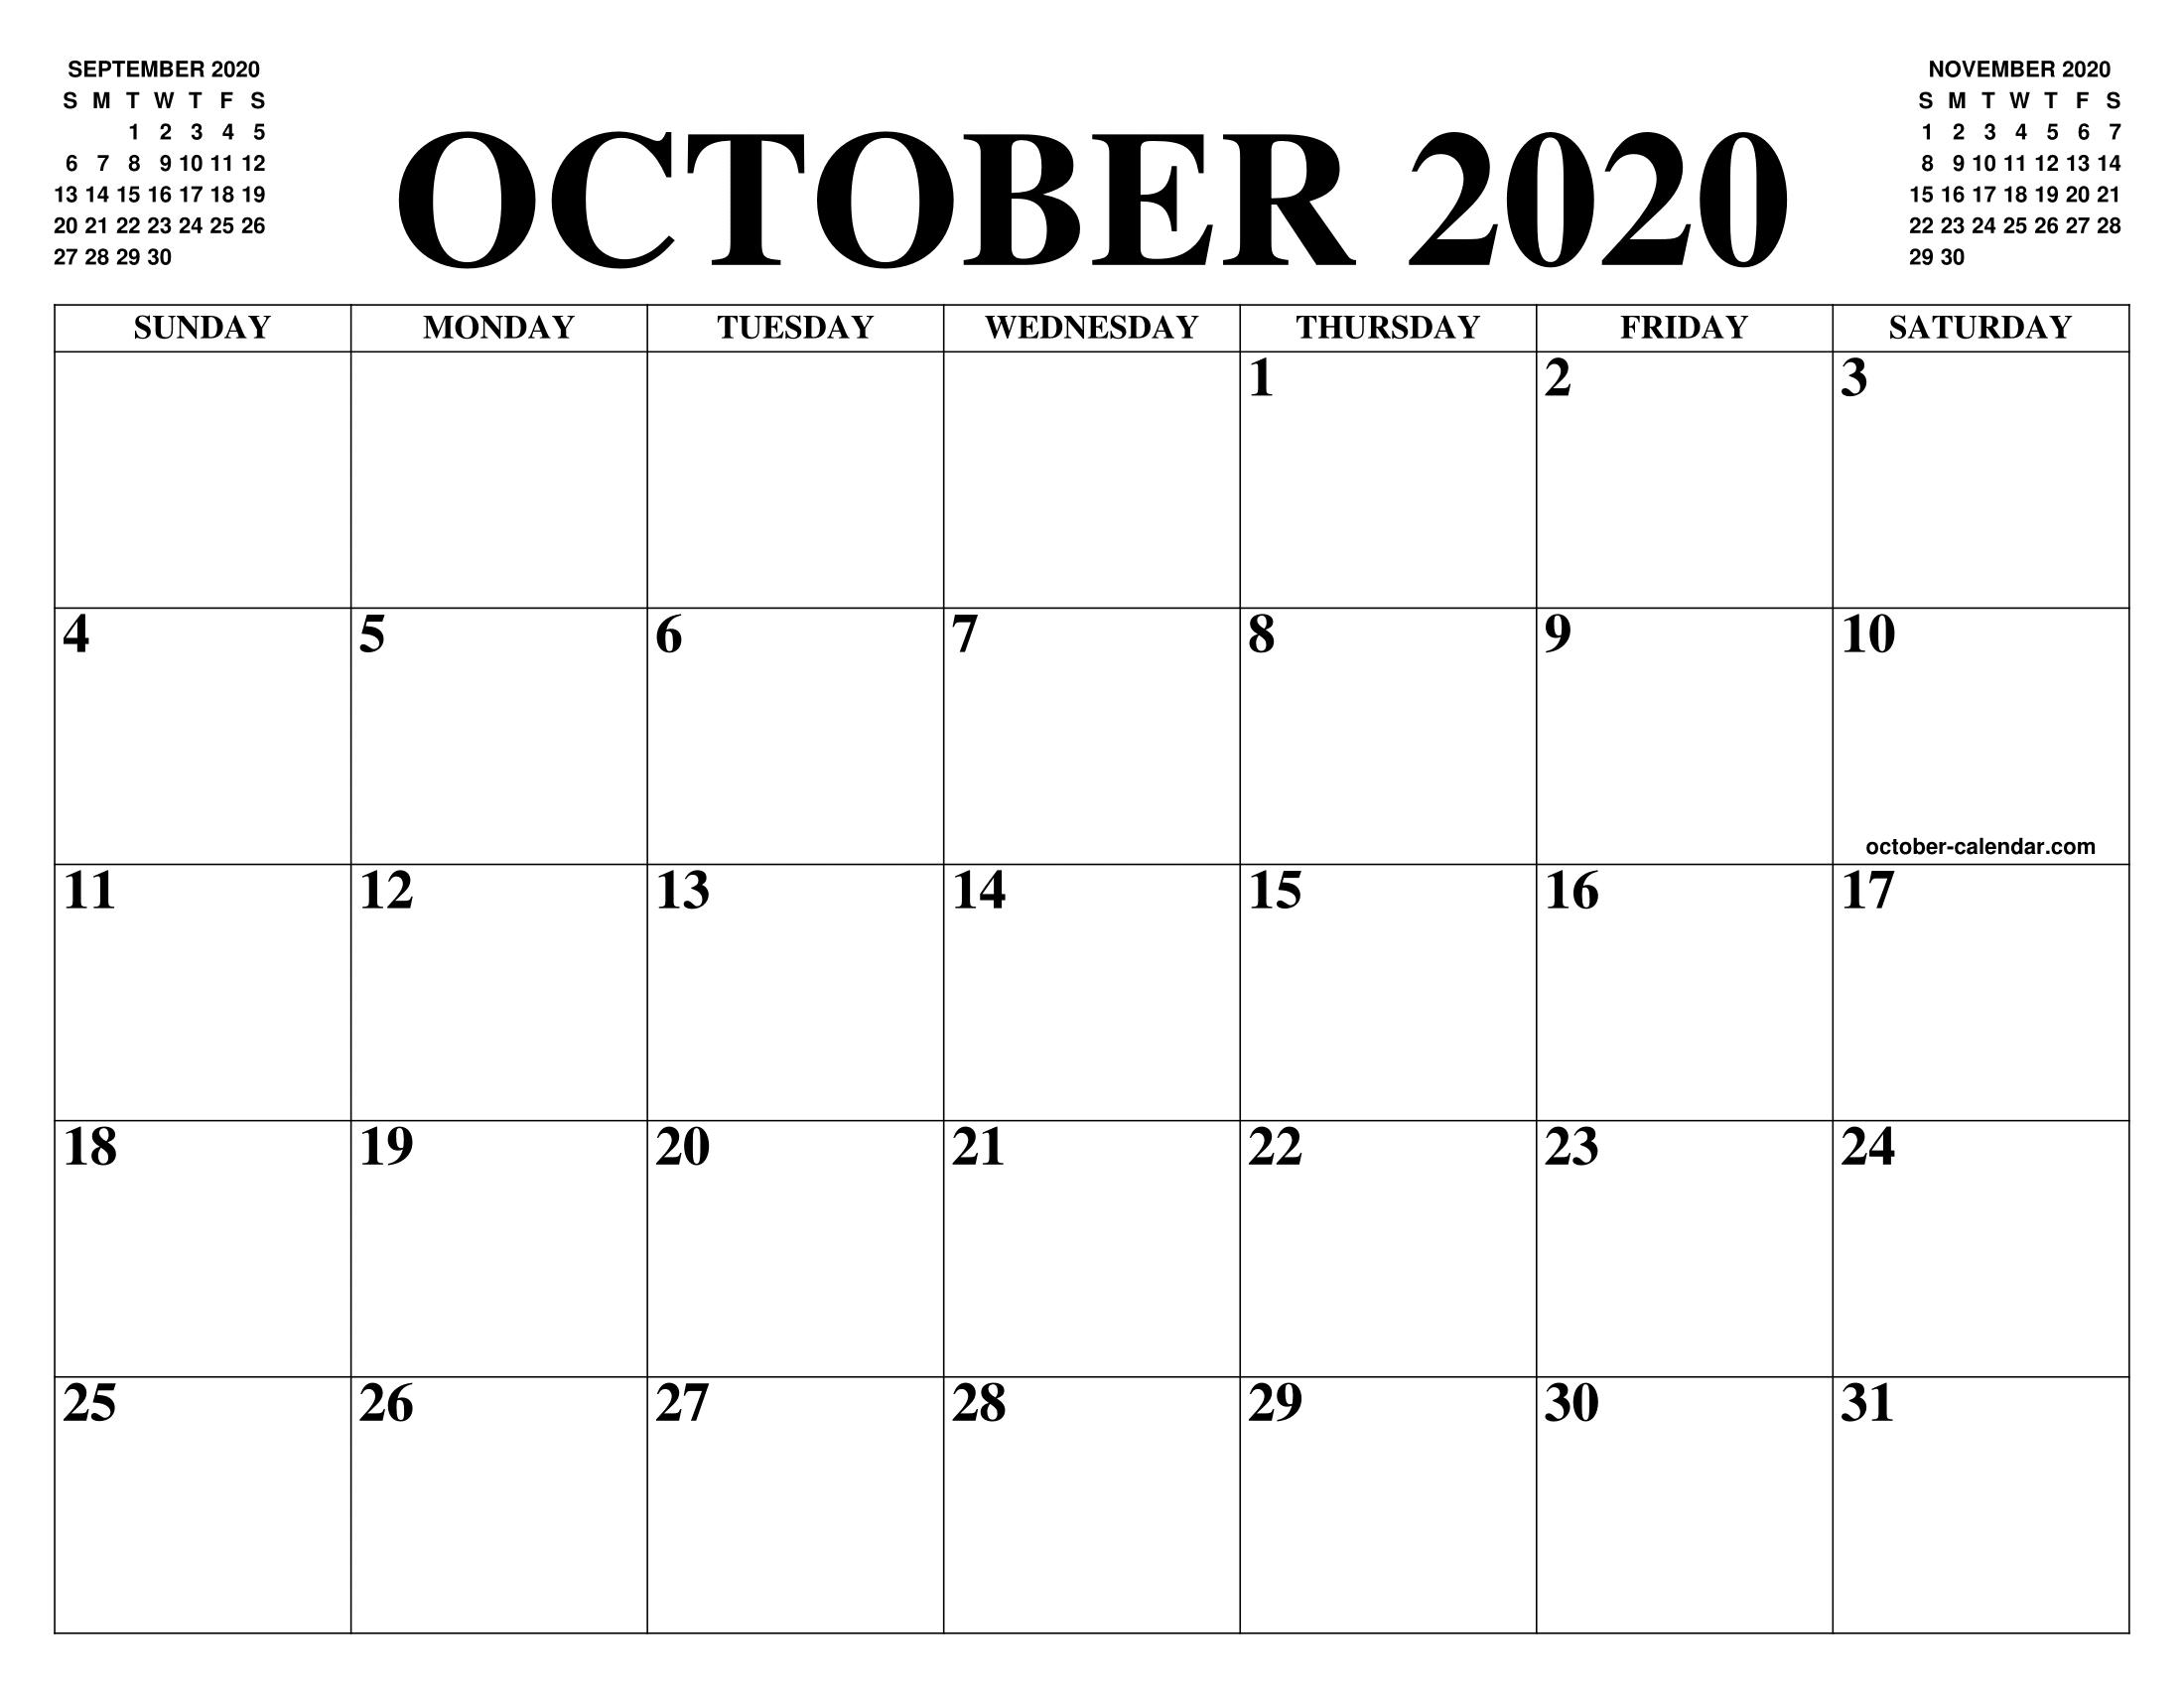 October 2020 Printable Calendar.October 2020 Calendar Of The Month Free Printable October Calendar